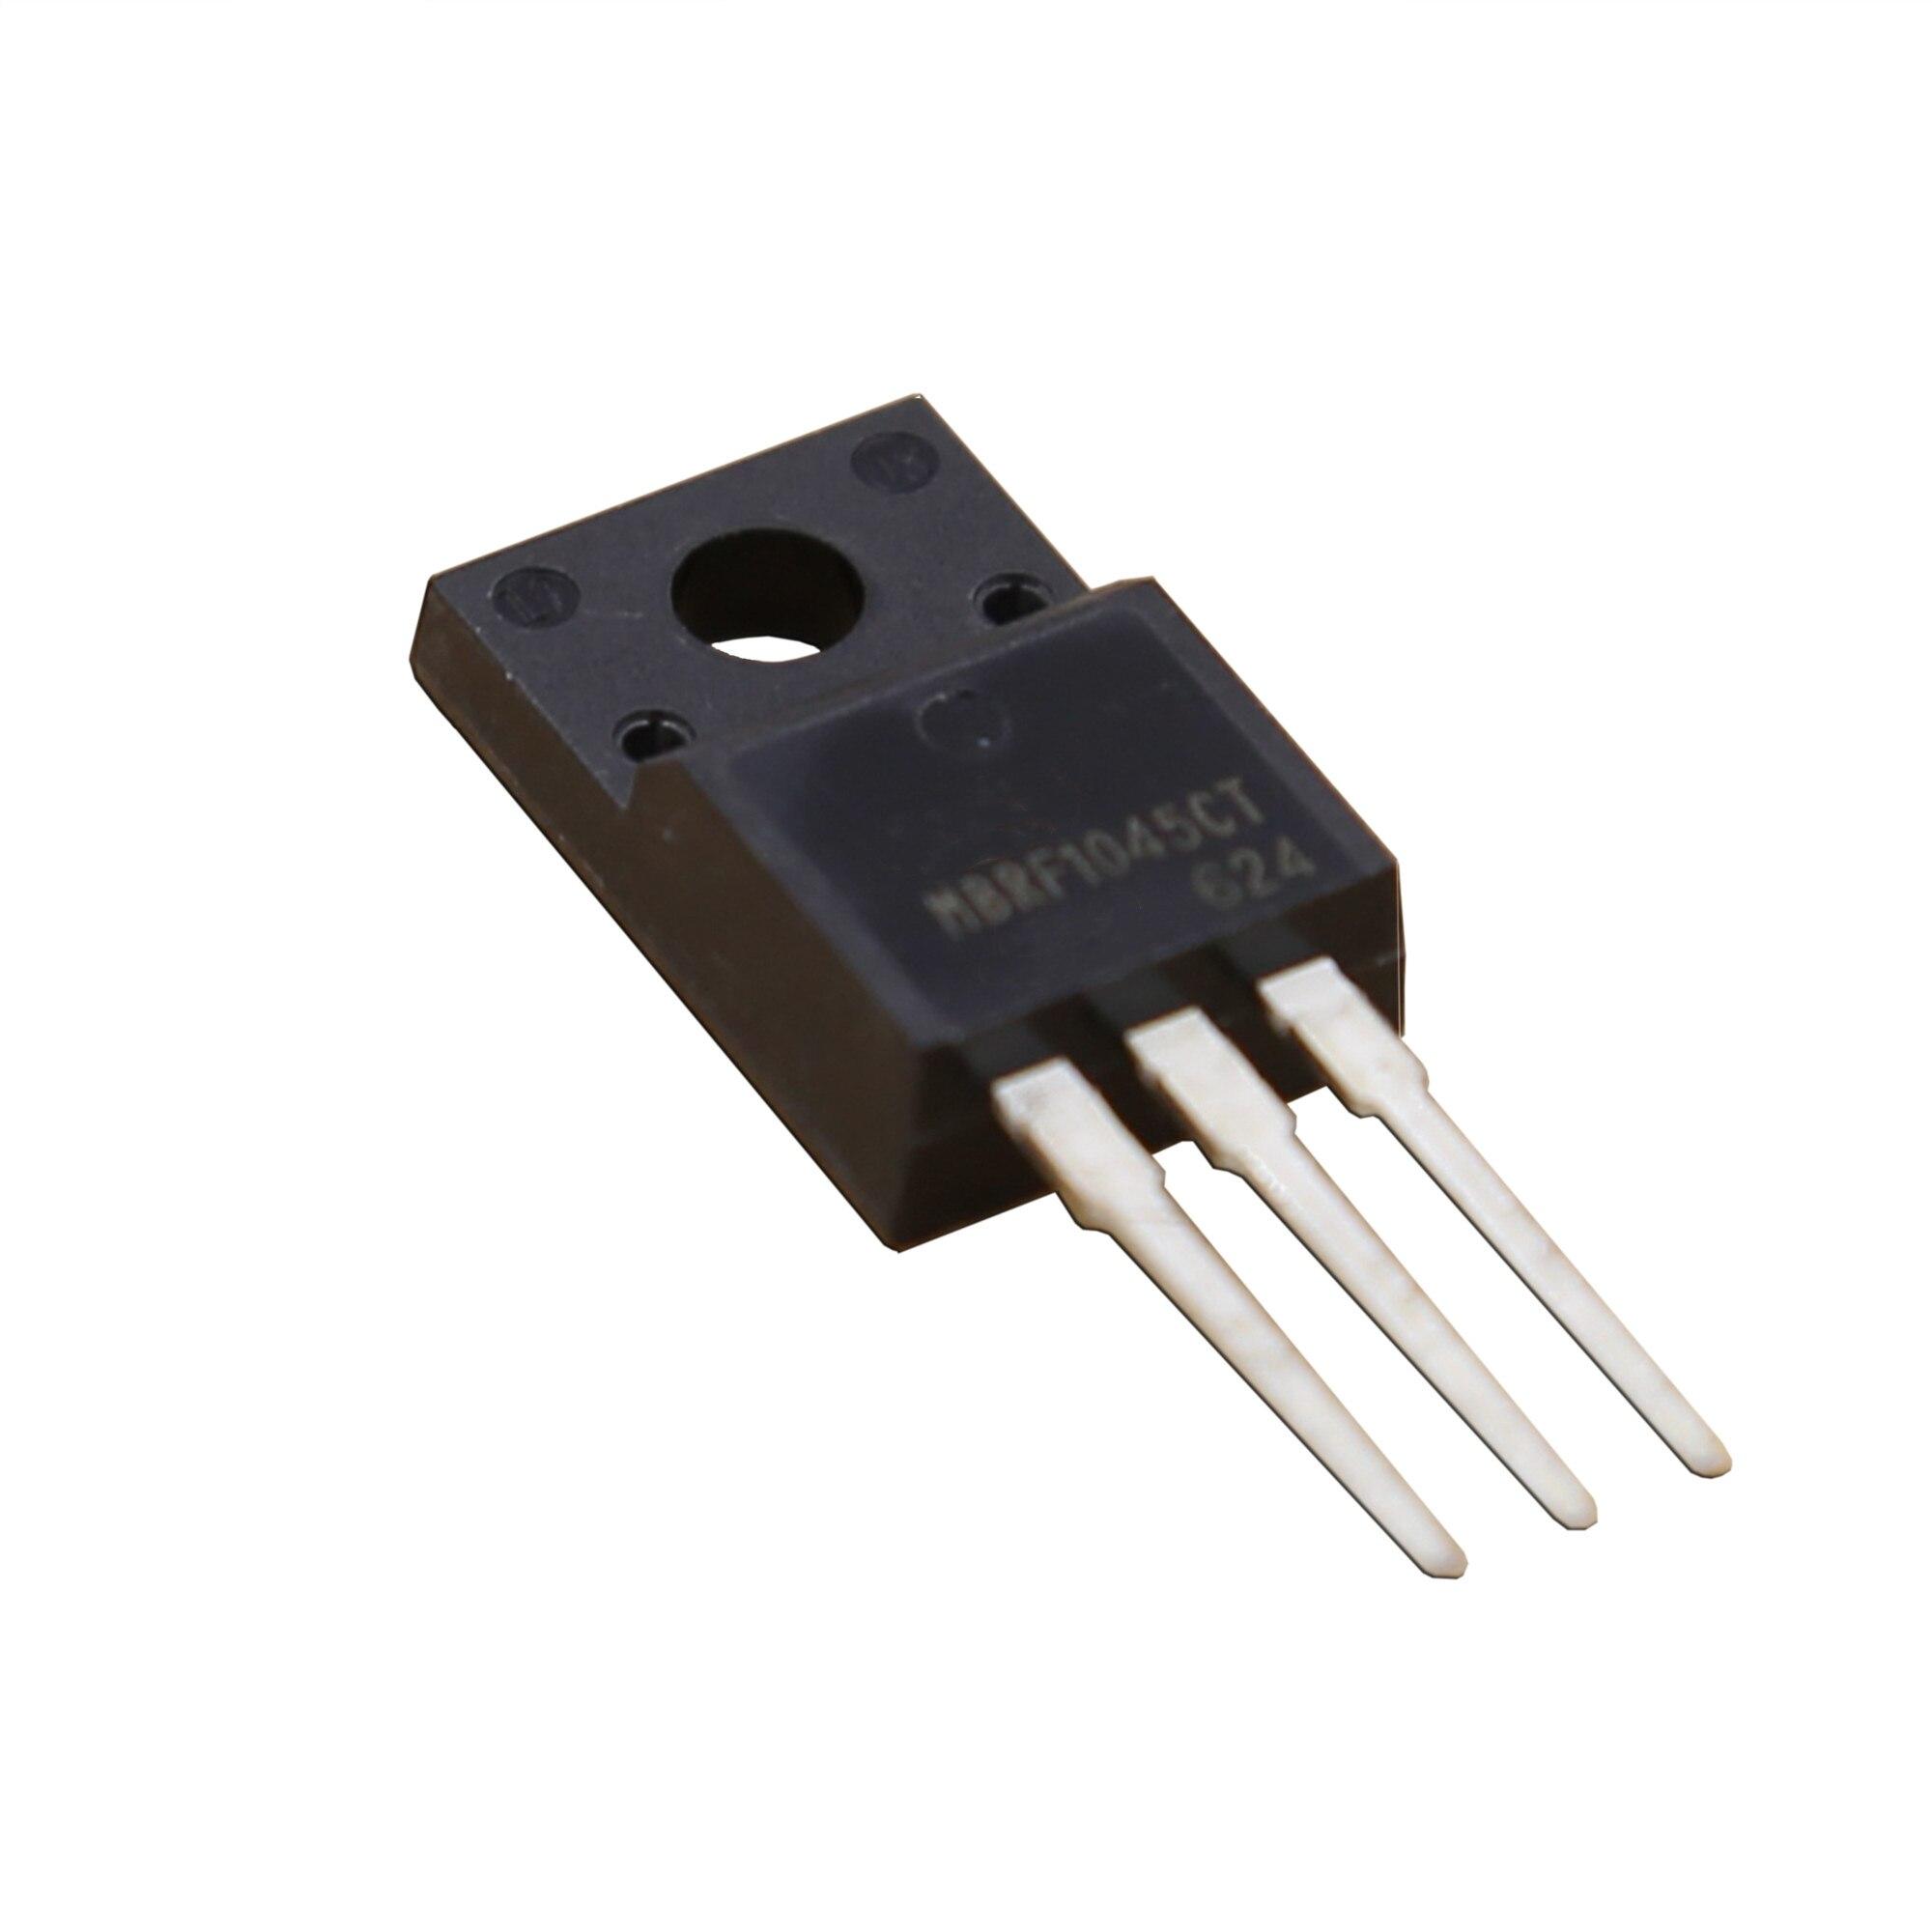 50pcs 10SQ045 10A 45V Schottky Rectifiers R-6